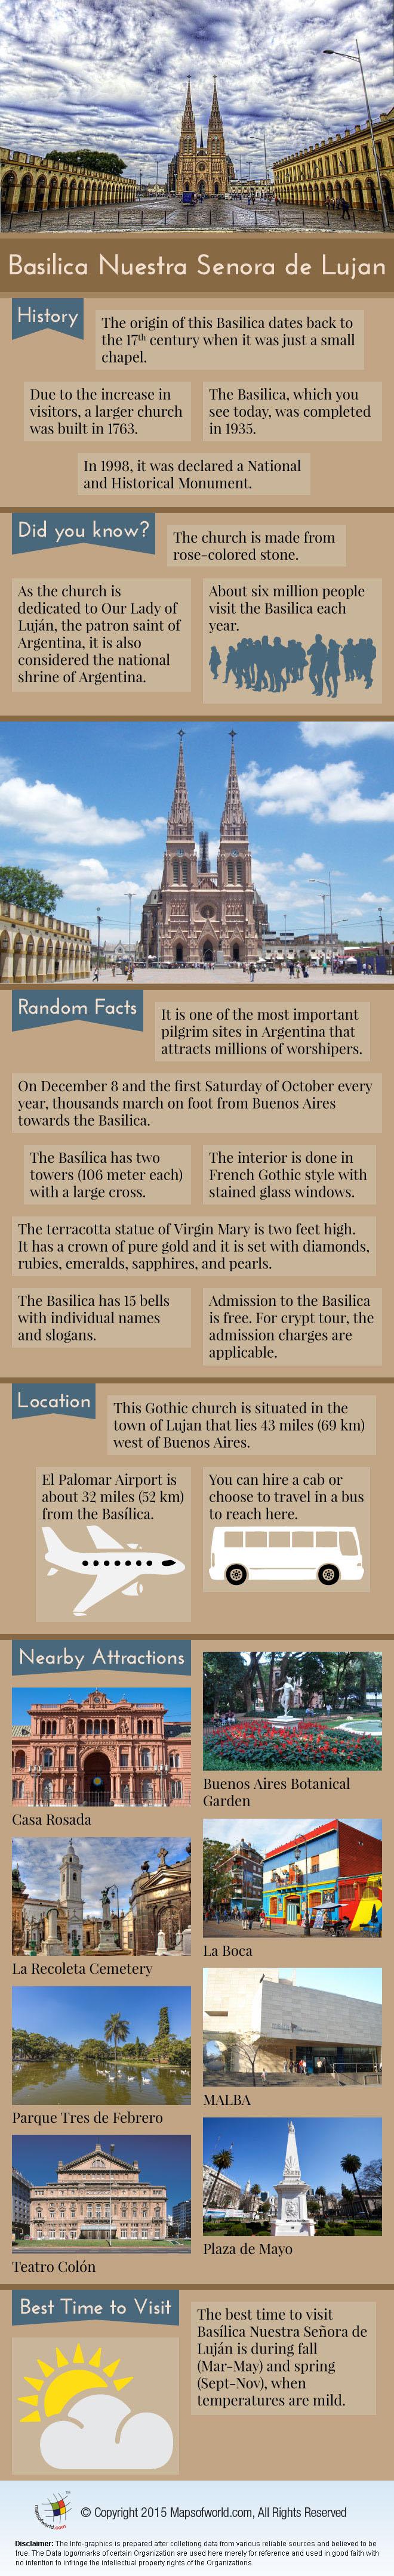 Basilica Nuestra Senora de Lujan Infographic